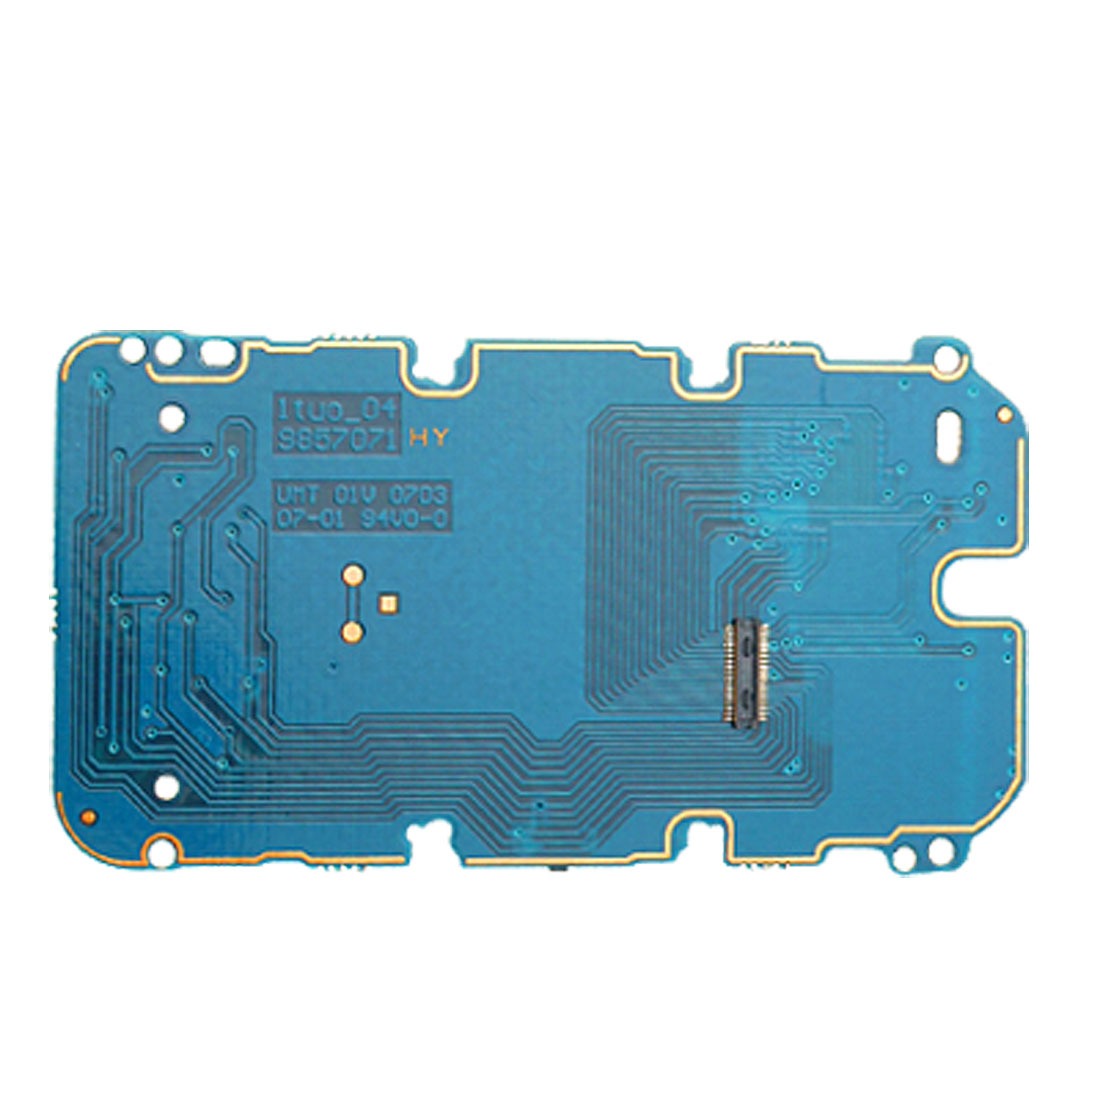 LCD Board PCB Keypad Keyboard Membrane for Nokia 5200